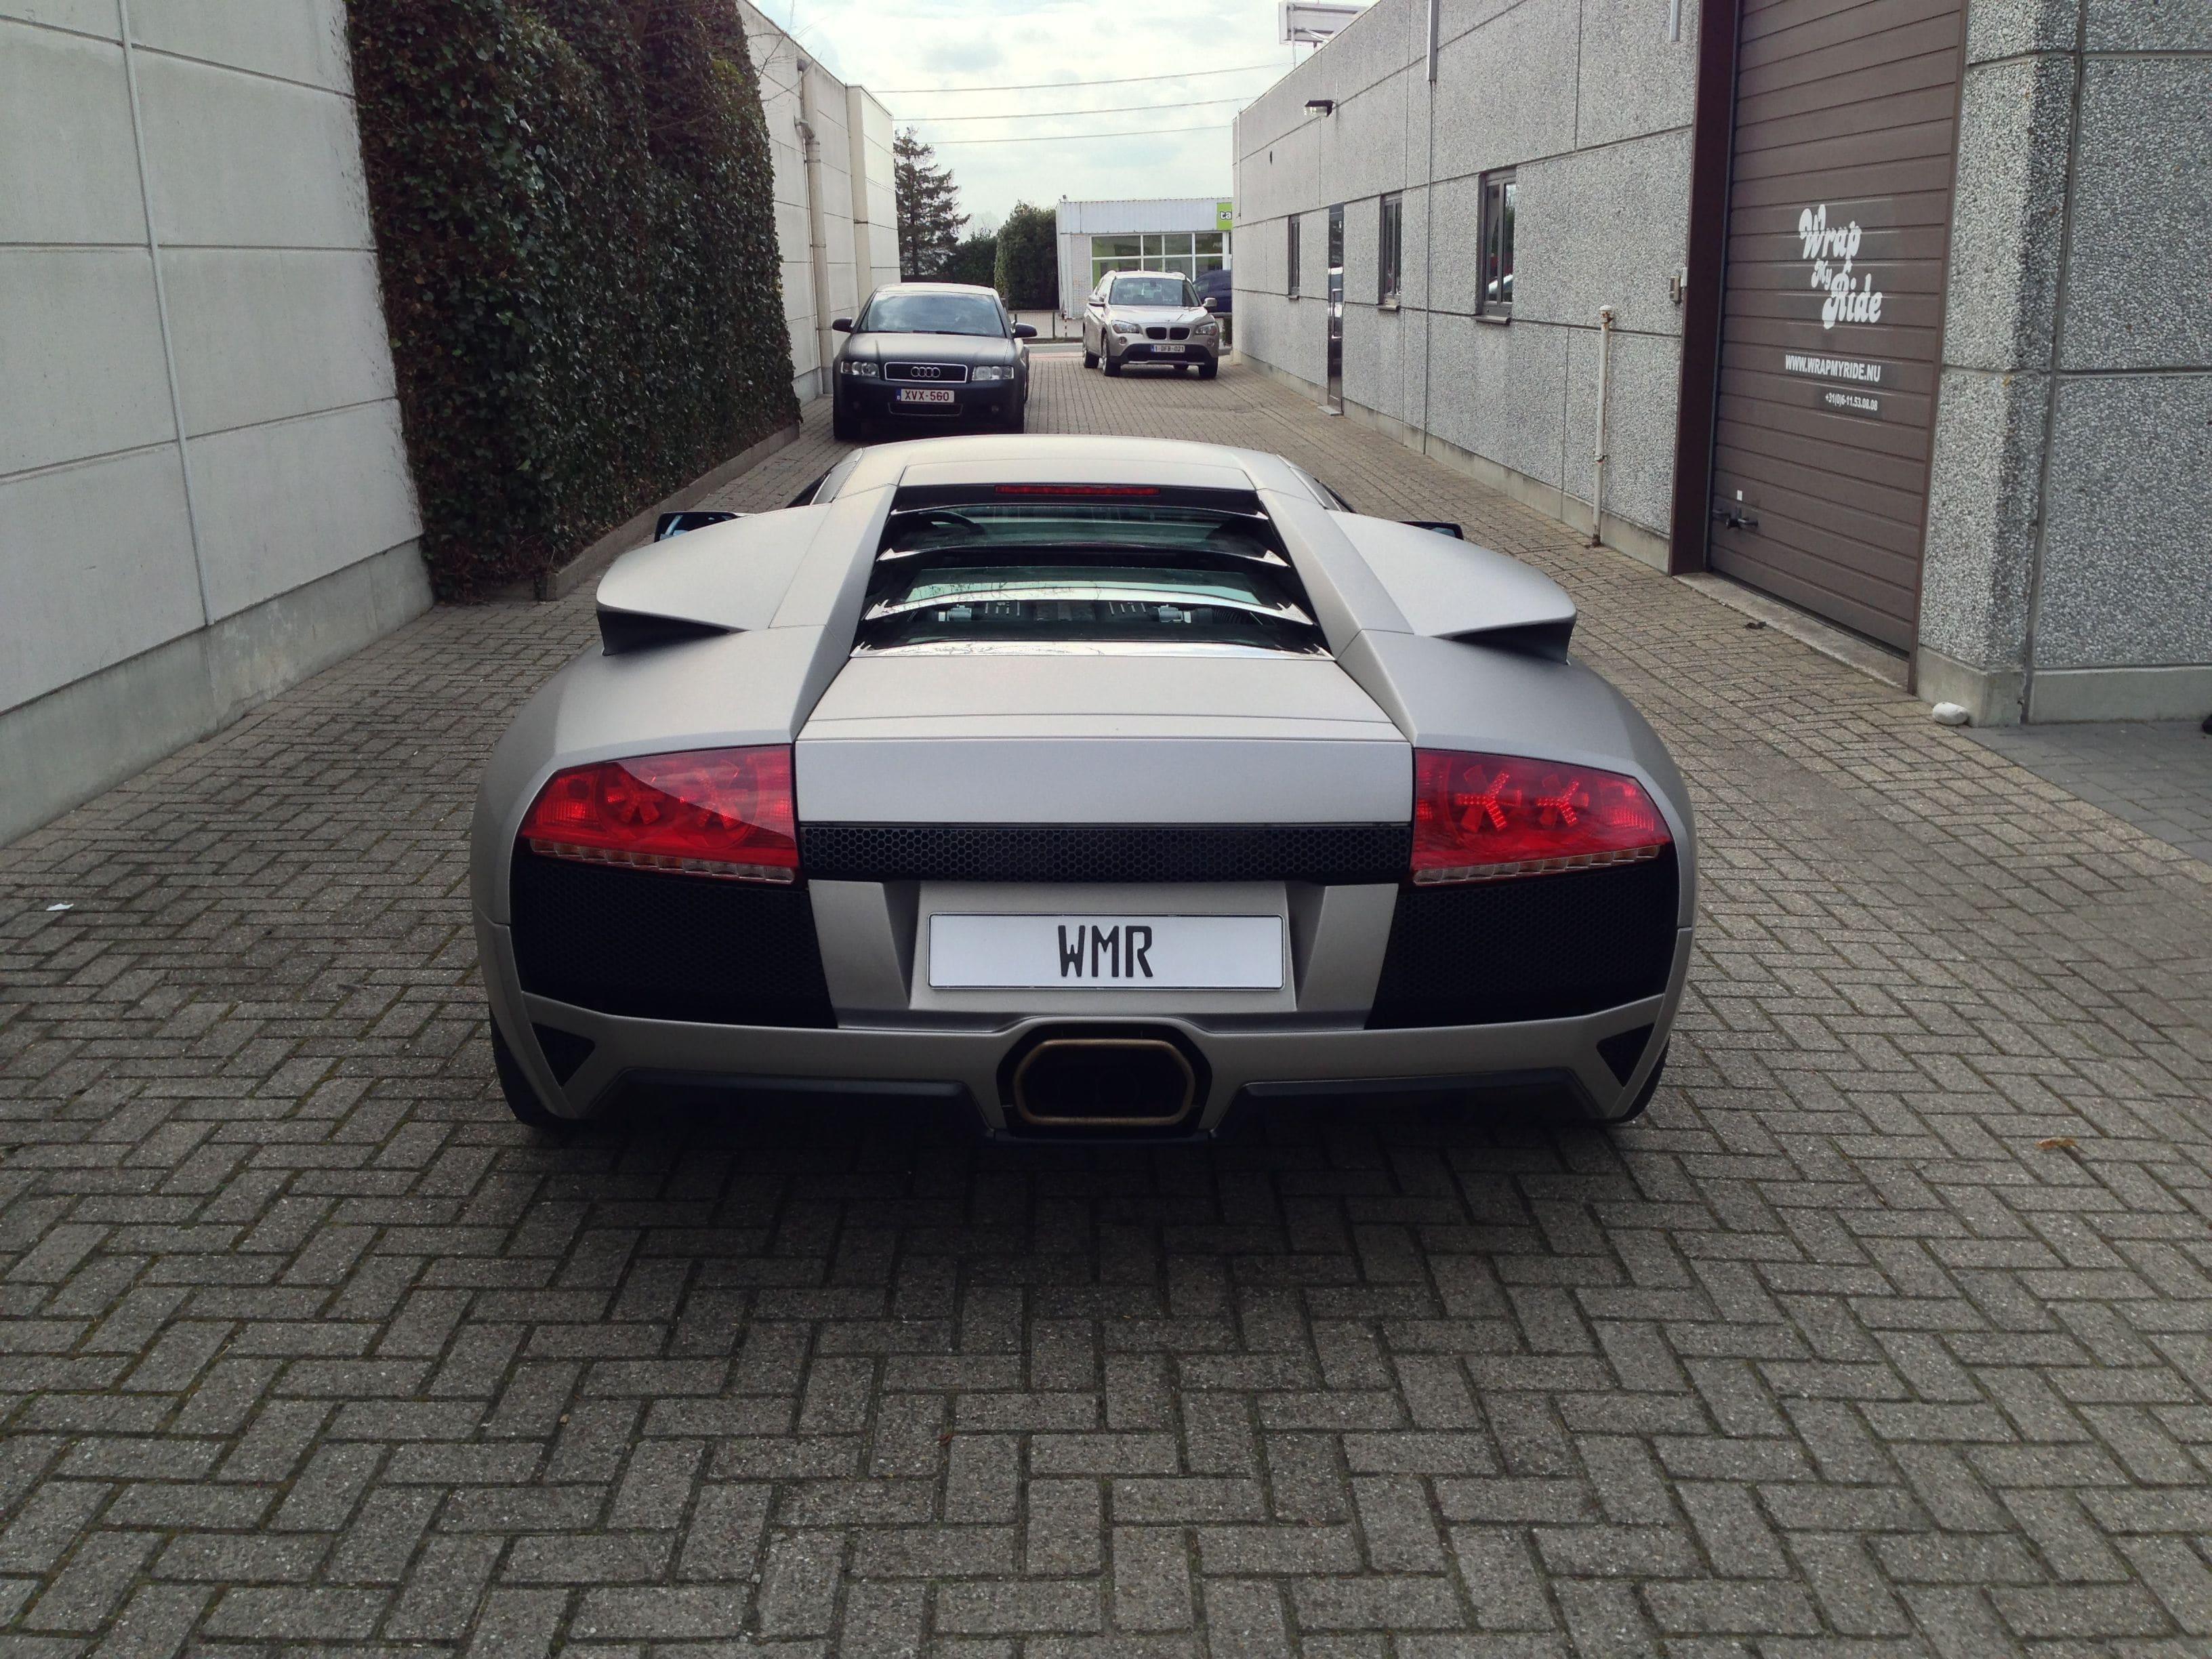 Lamborghini Murcialago LP670 met Gunpowder Wrap, Carwrapping door Wrapmyride.nu Foto-nr:5987, ©2021